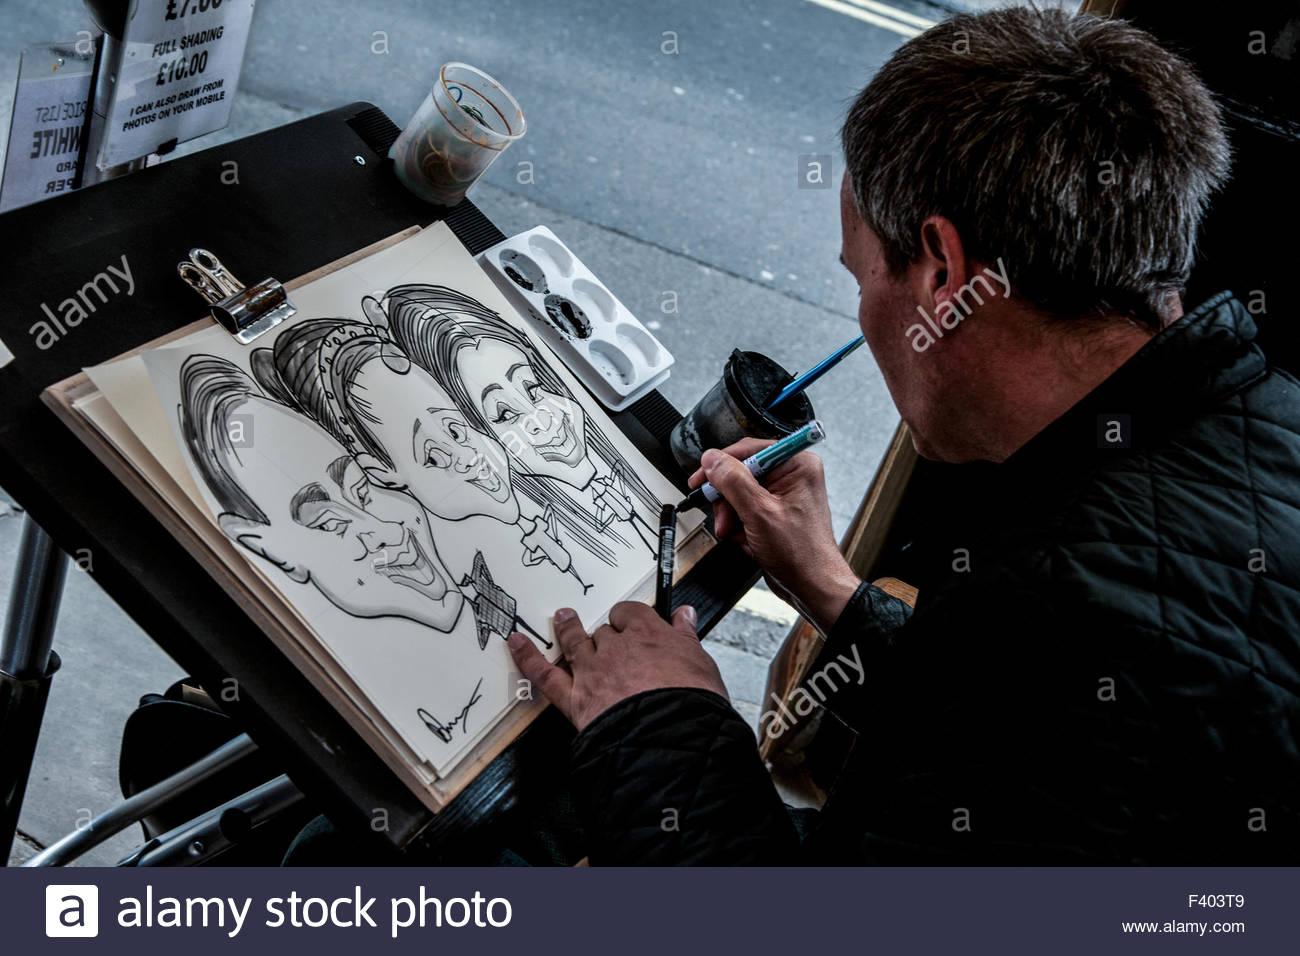 Streetart-Künstler in york Stockbild